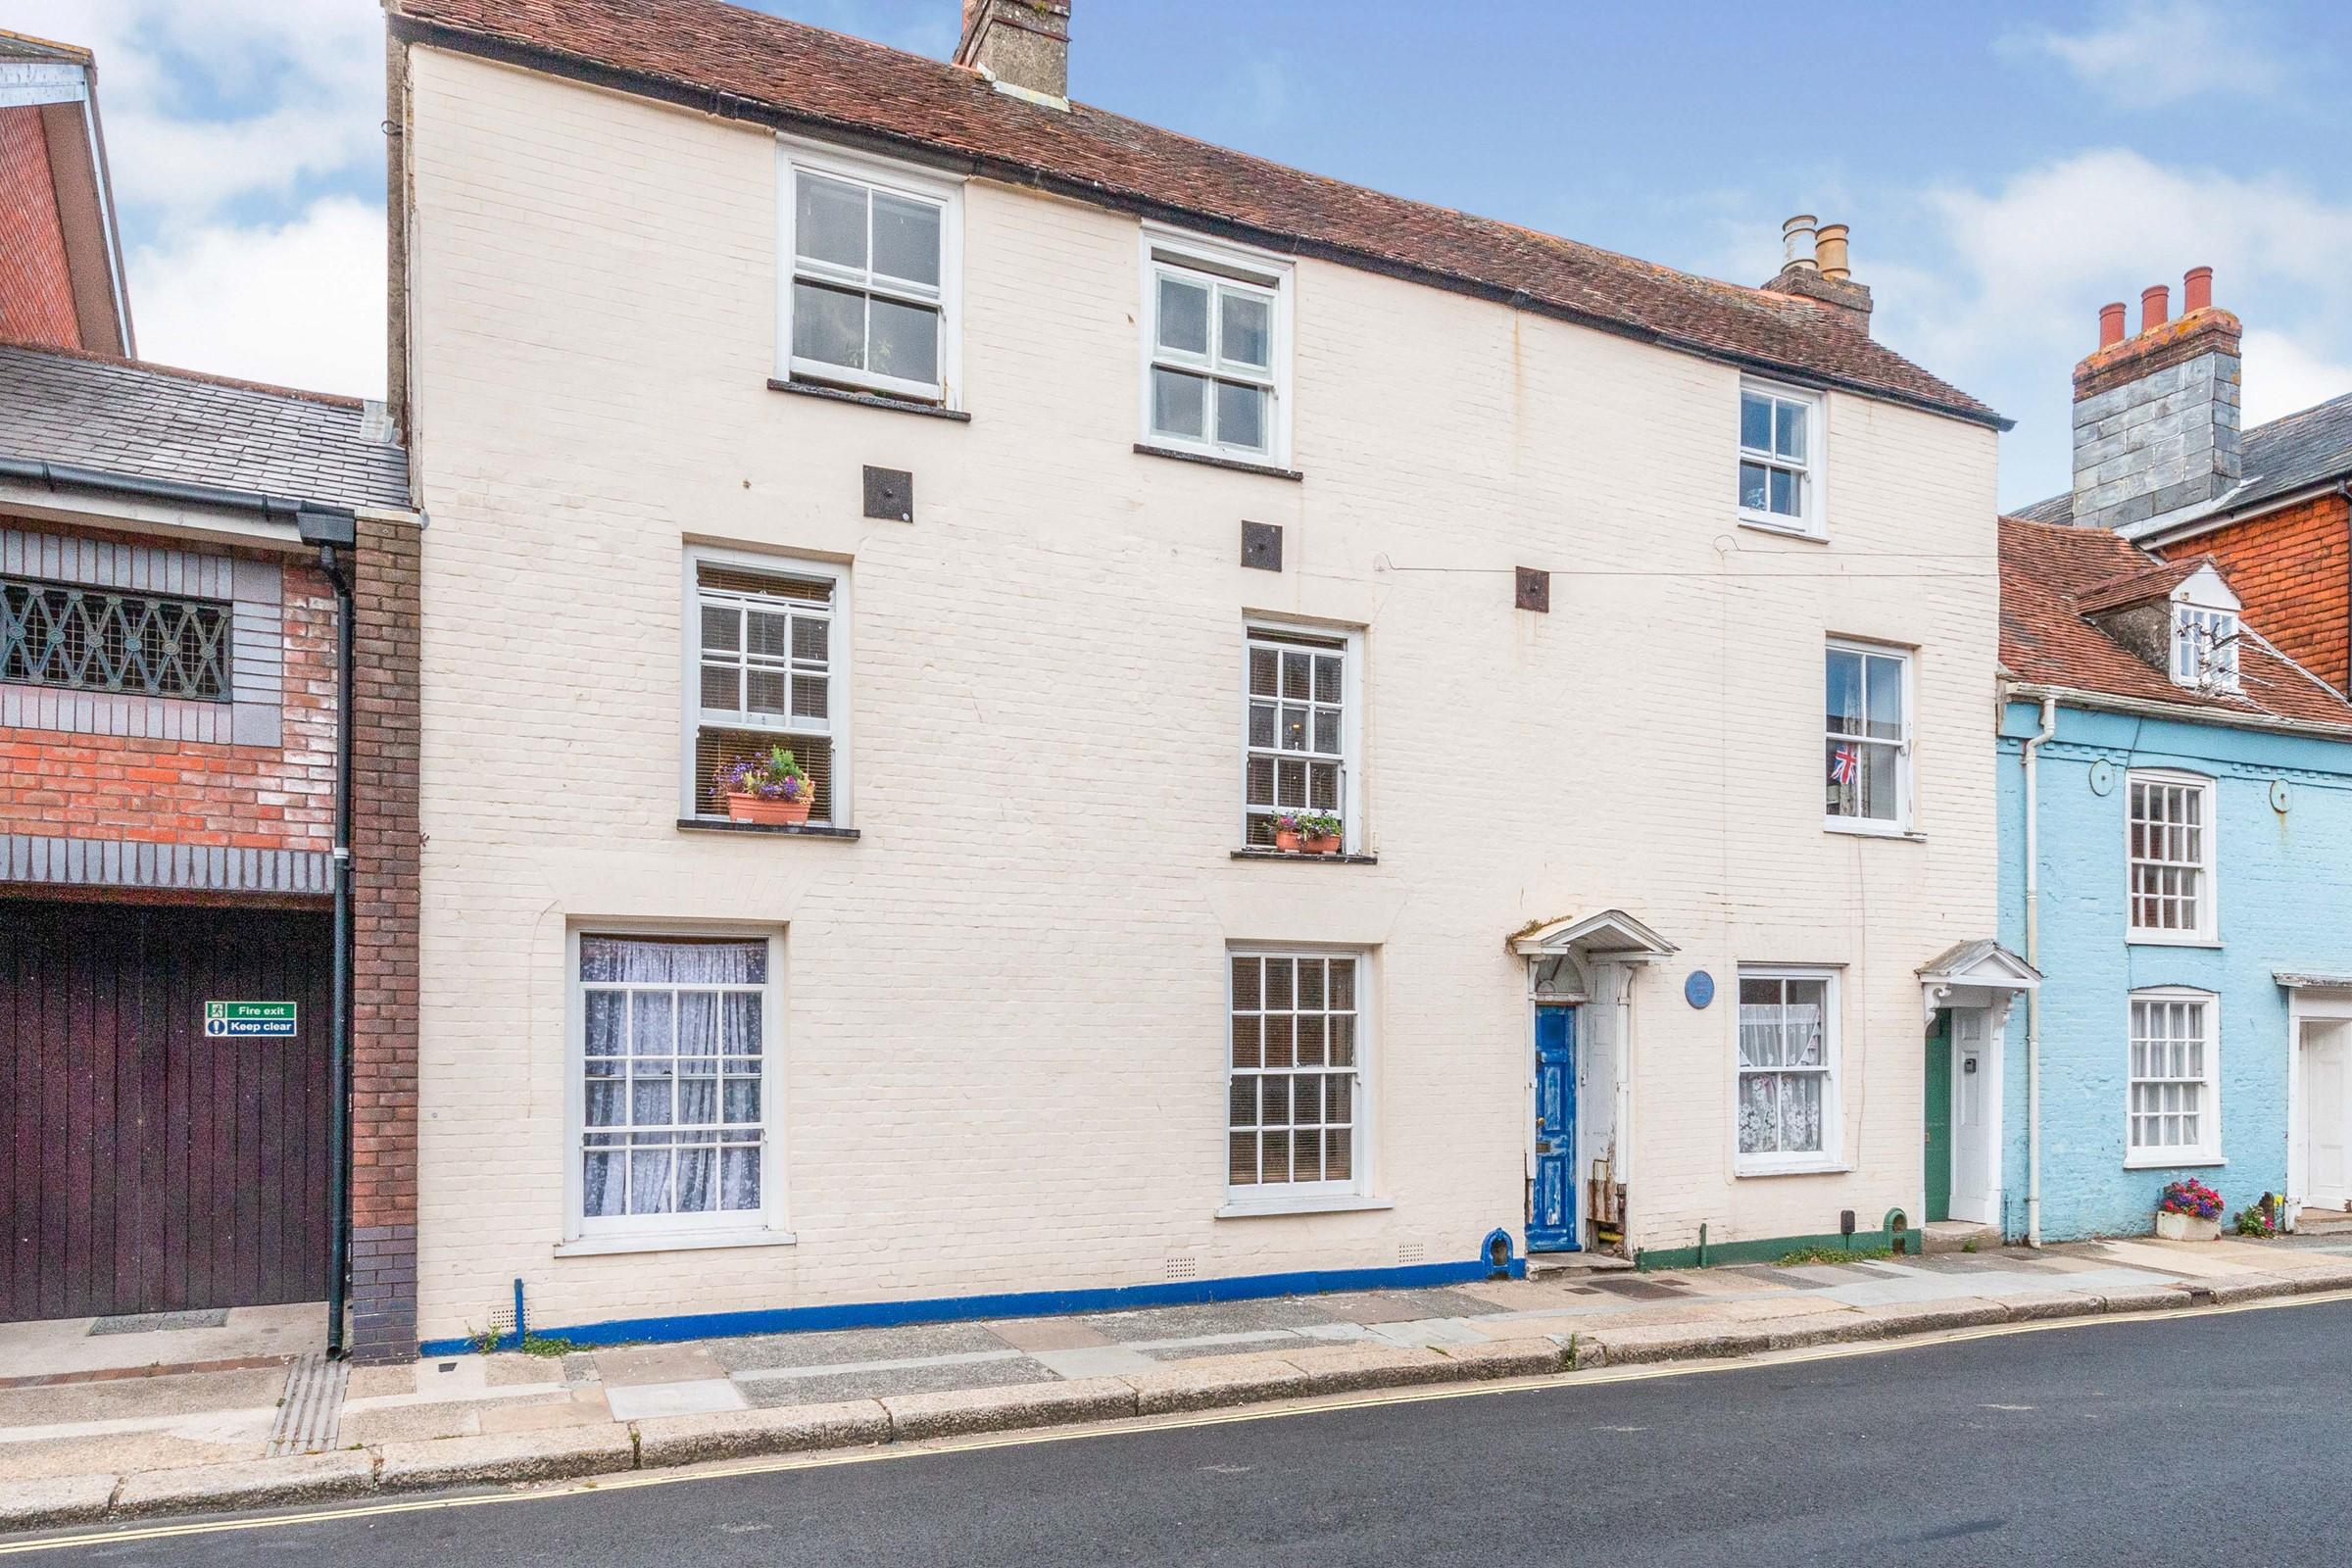 Lugley Street, Newport, Isle Of Wight, ., PO30